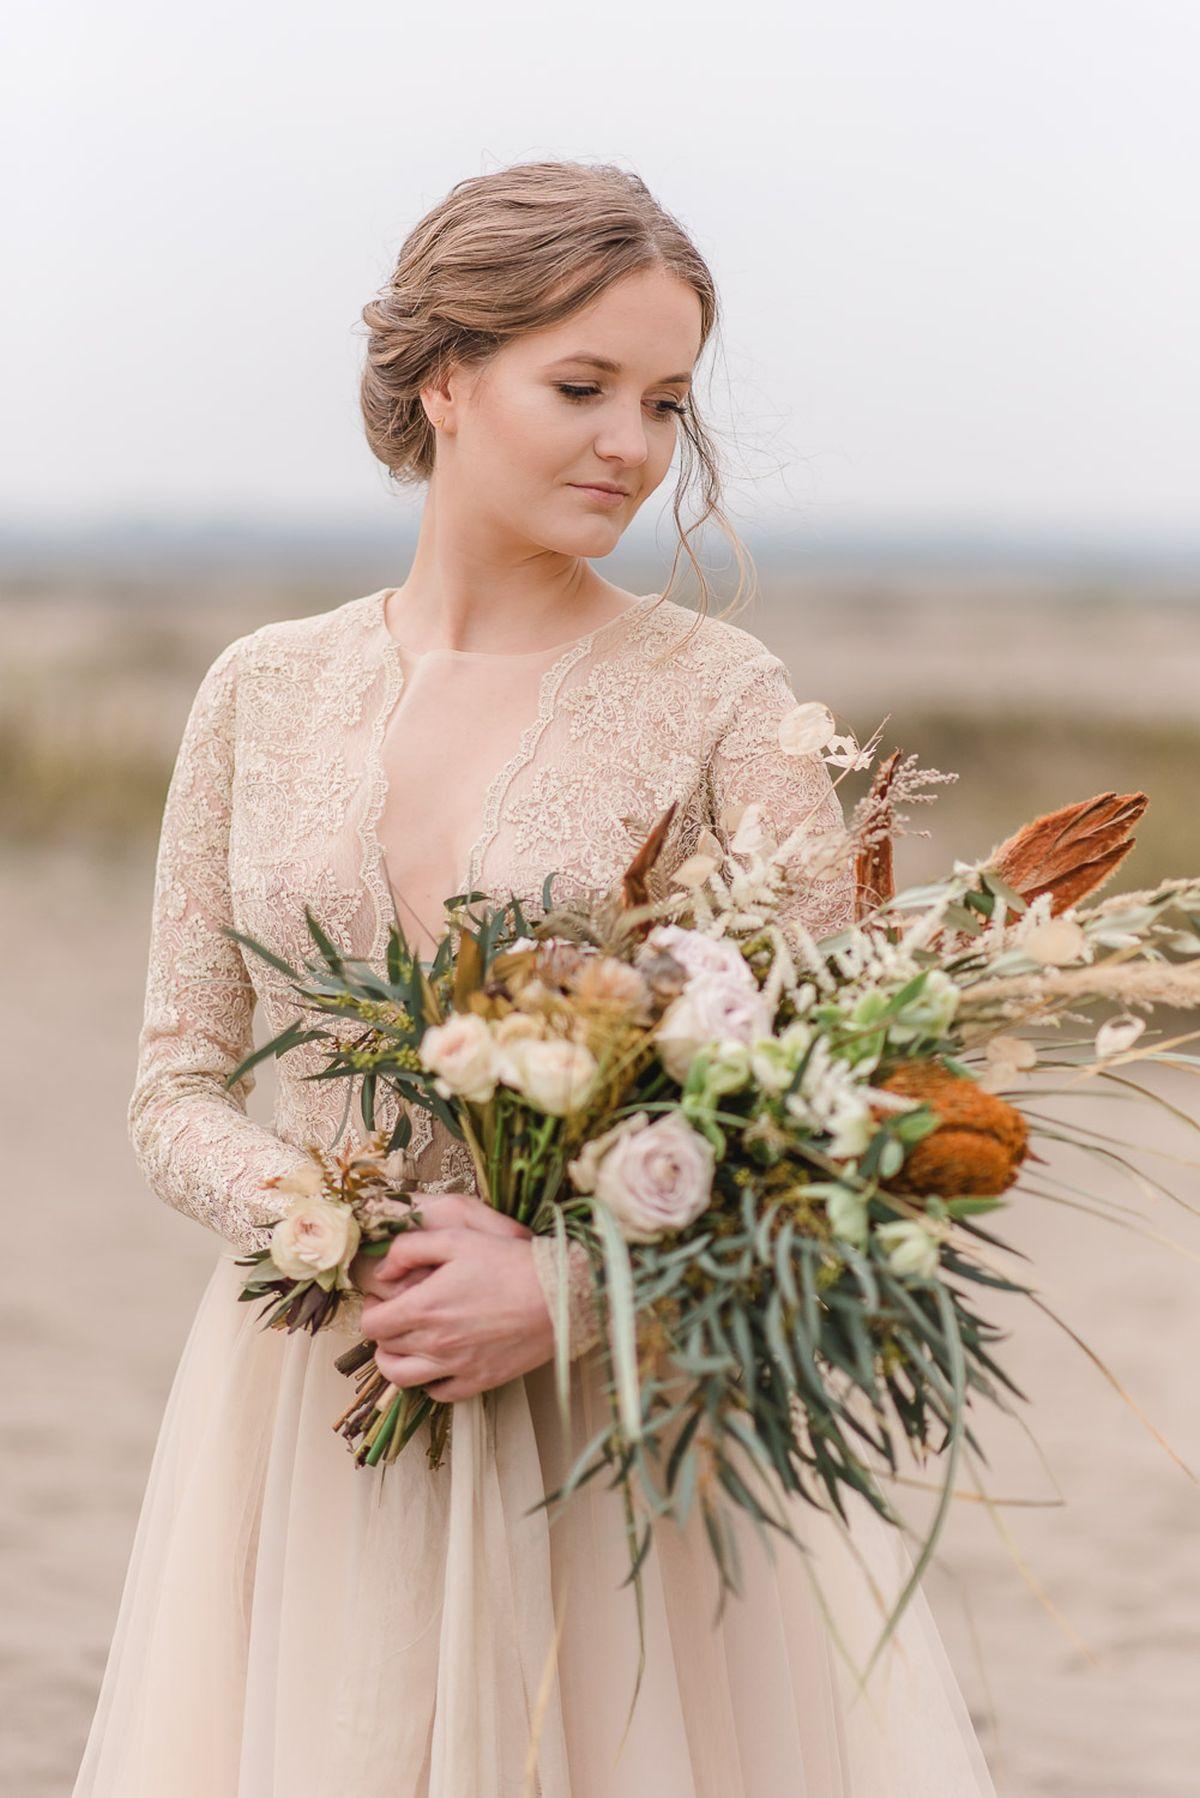 aschaaa-photography-wedding-shoot-wüste (16)